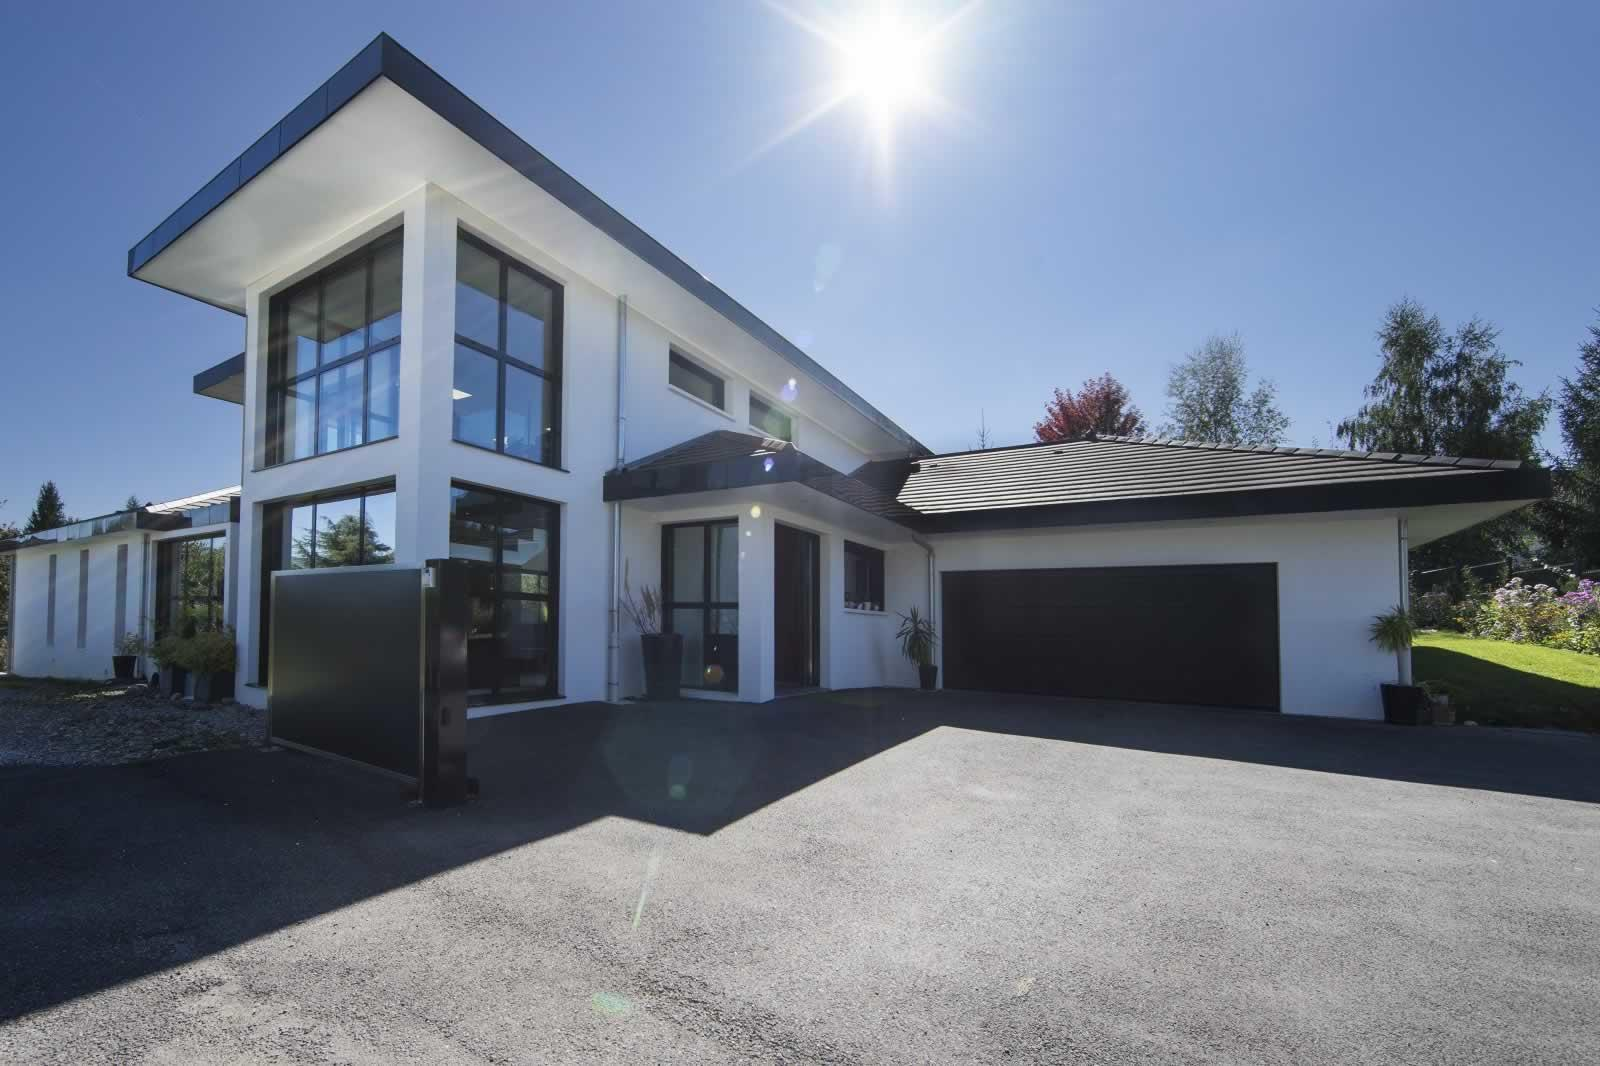 maison-architecte-a-vendre-cuvat-salle-de-sport-jardin-piscine-terrasse